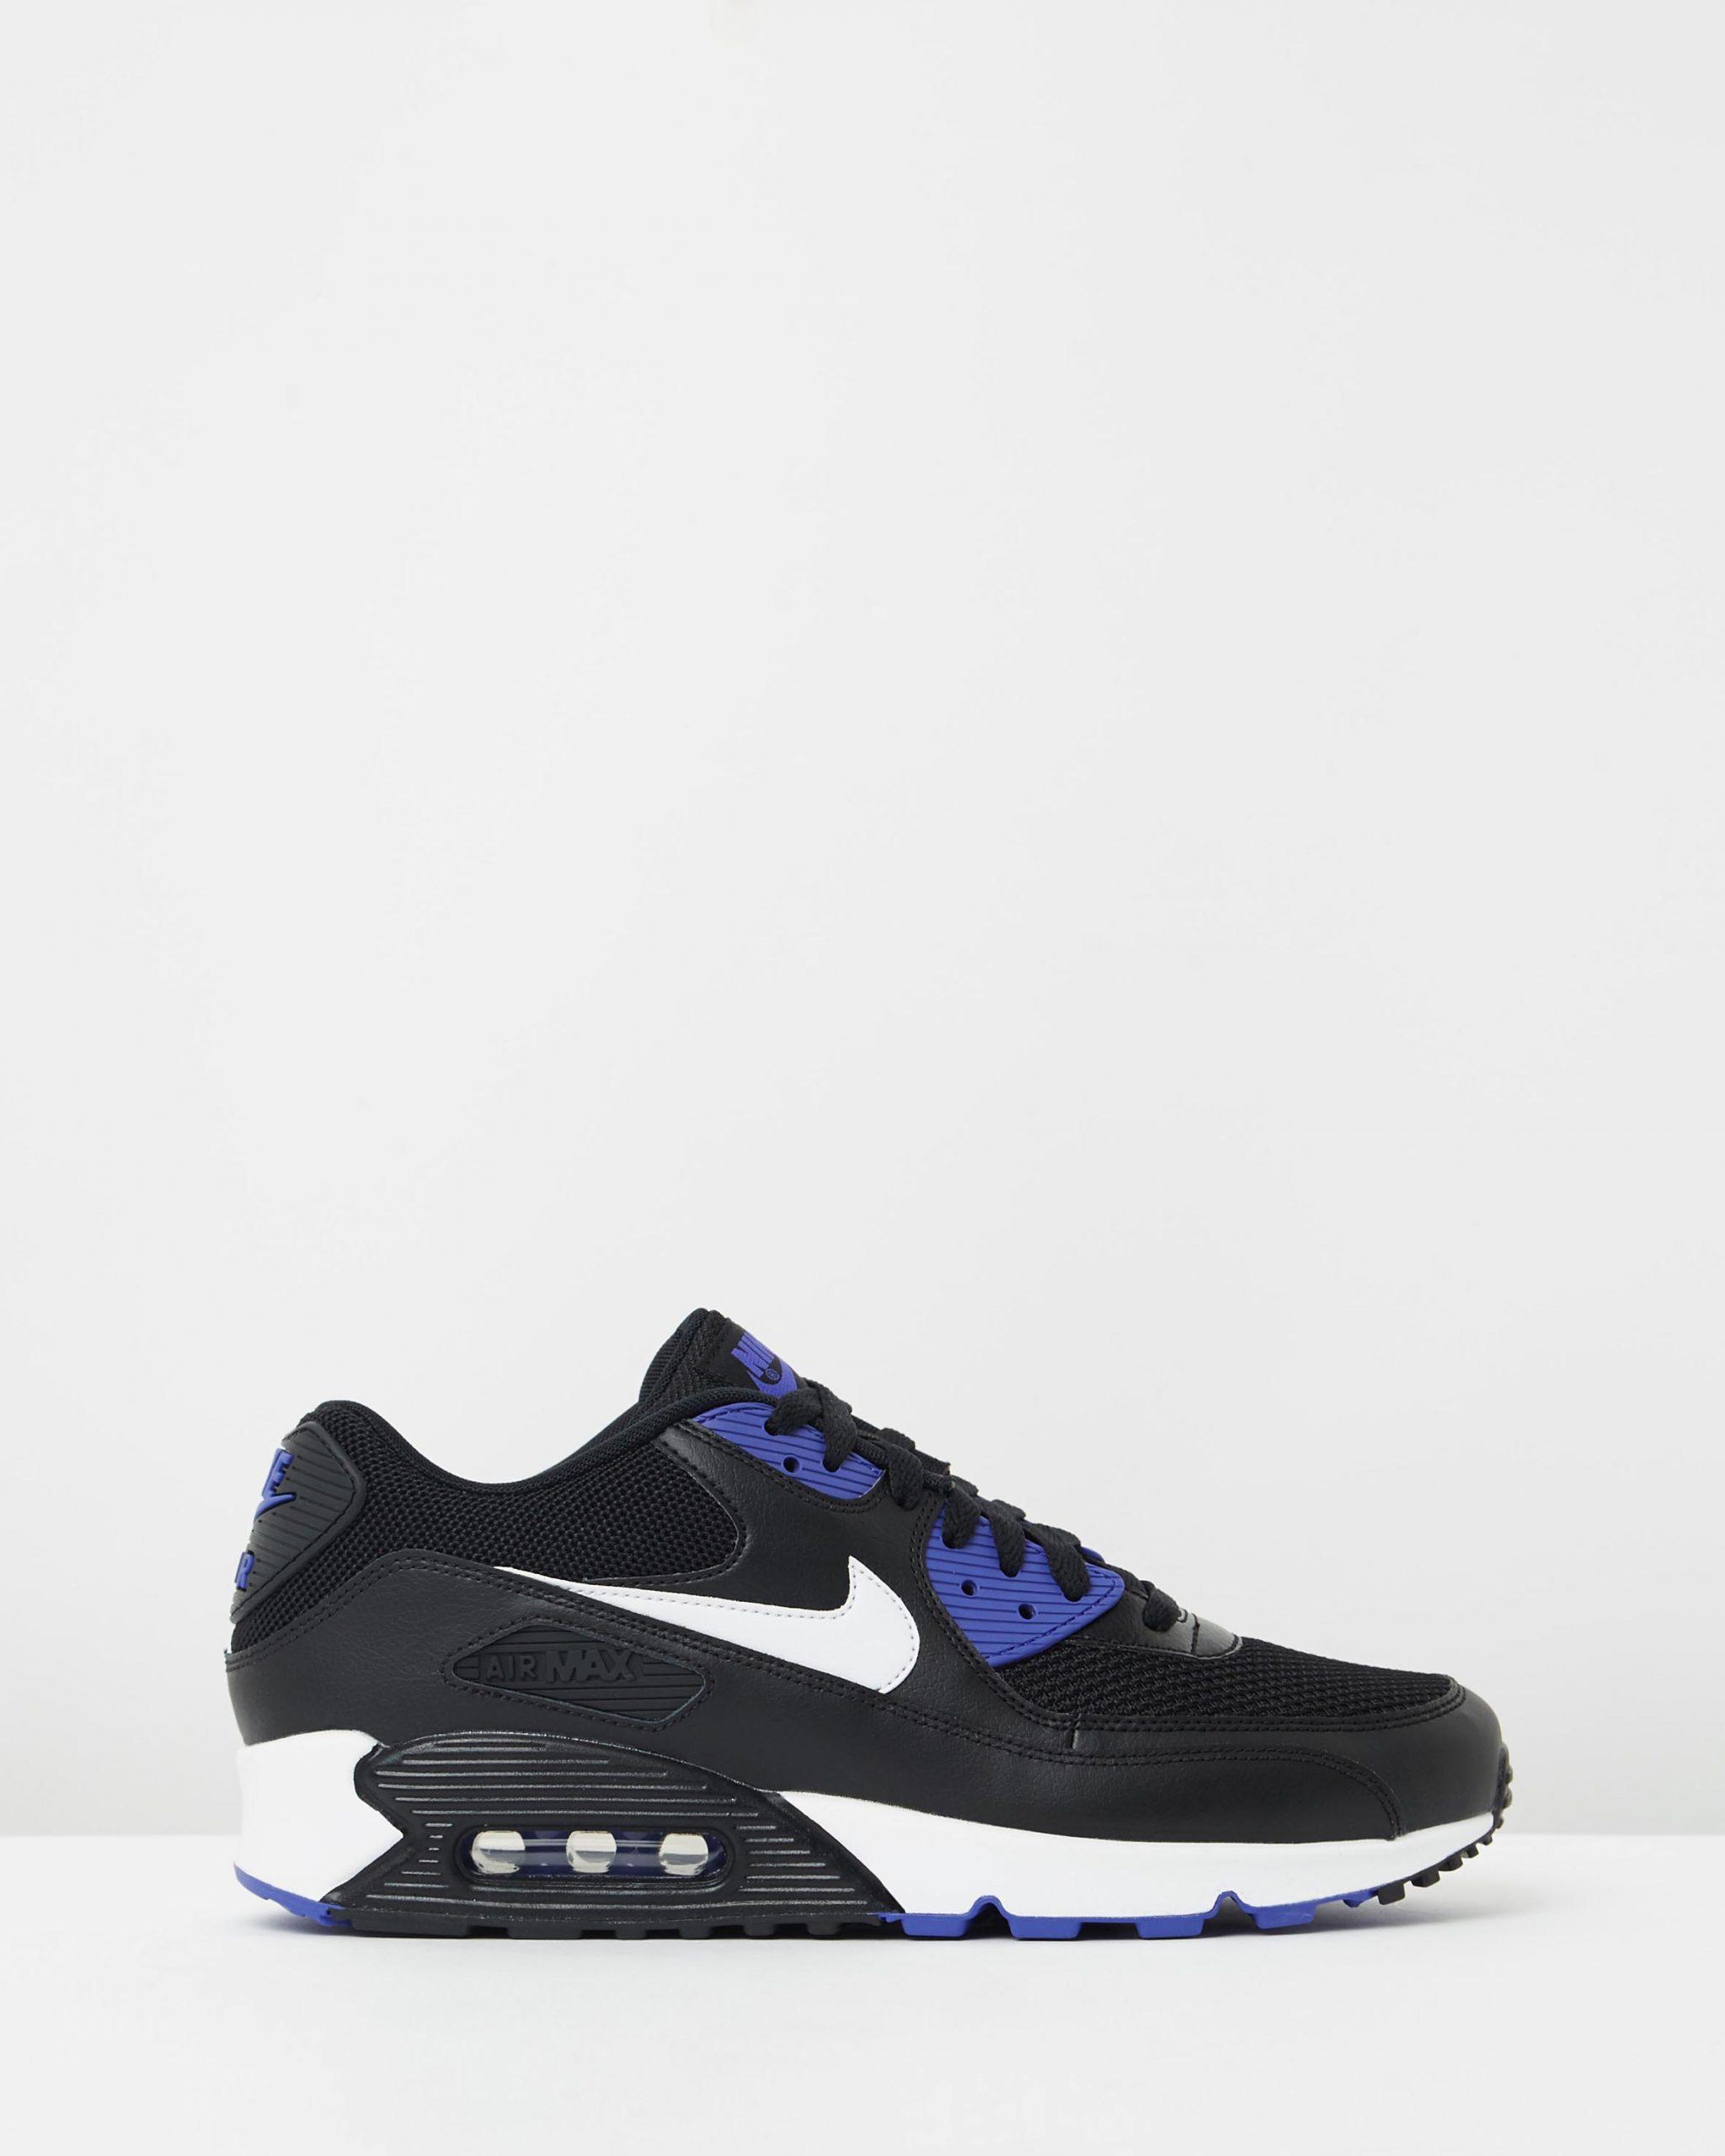 Nike Air Max 90 Essential Black White & Persian Violet